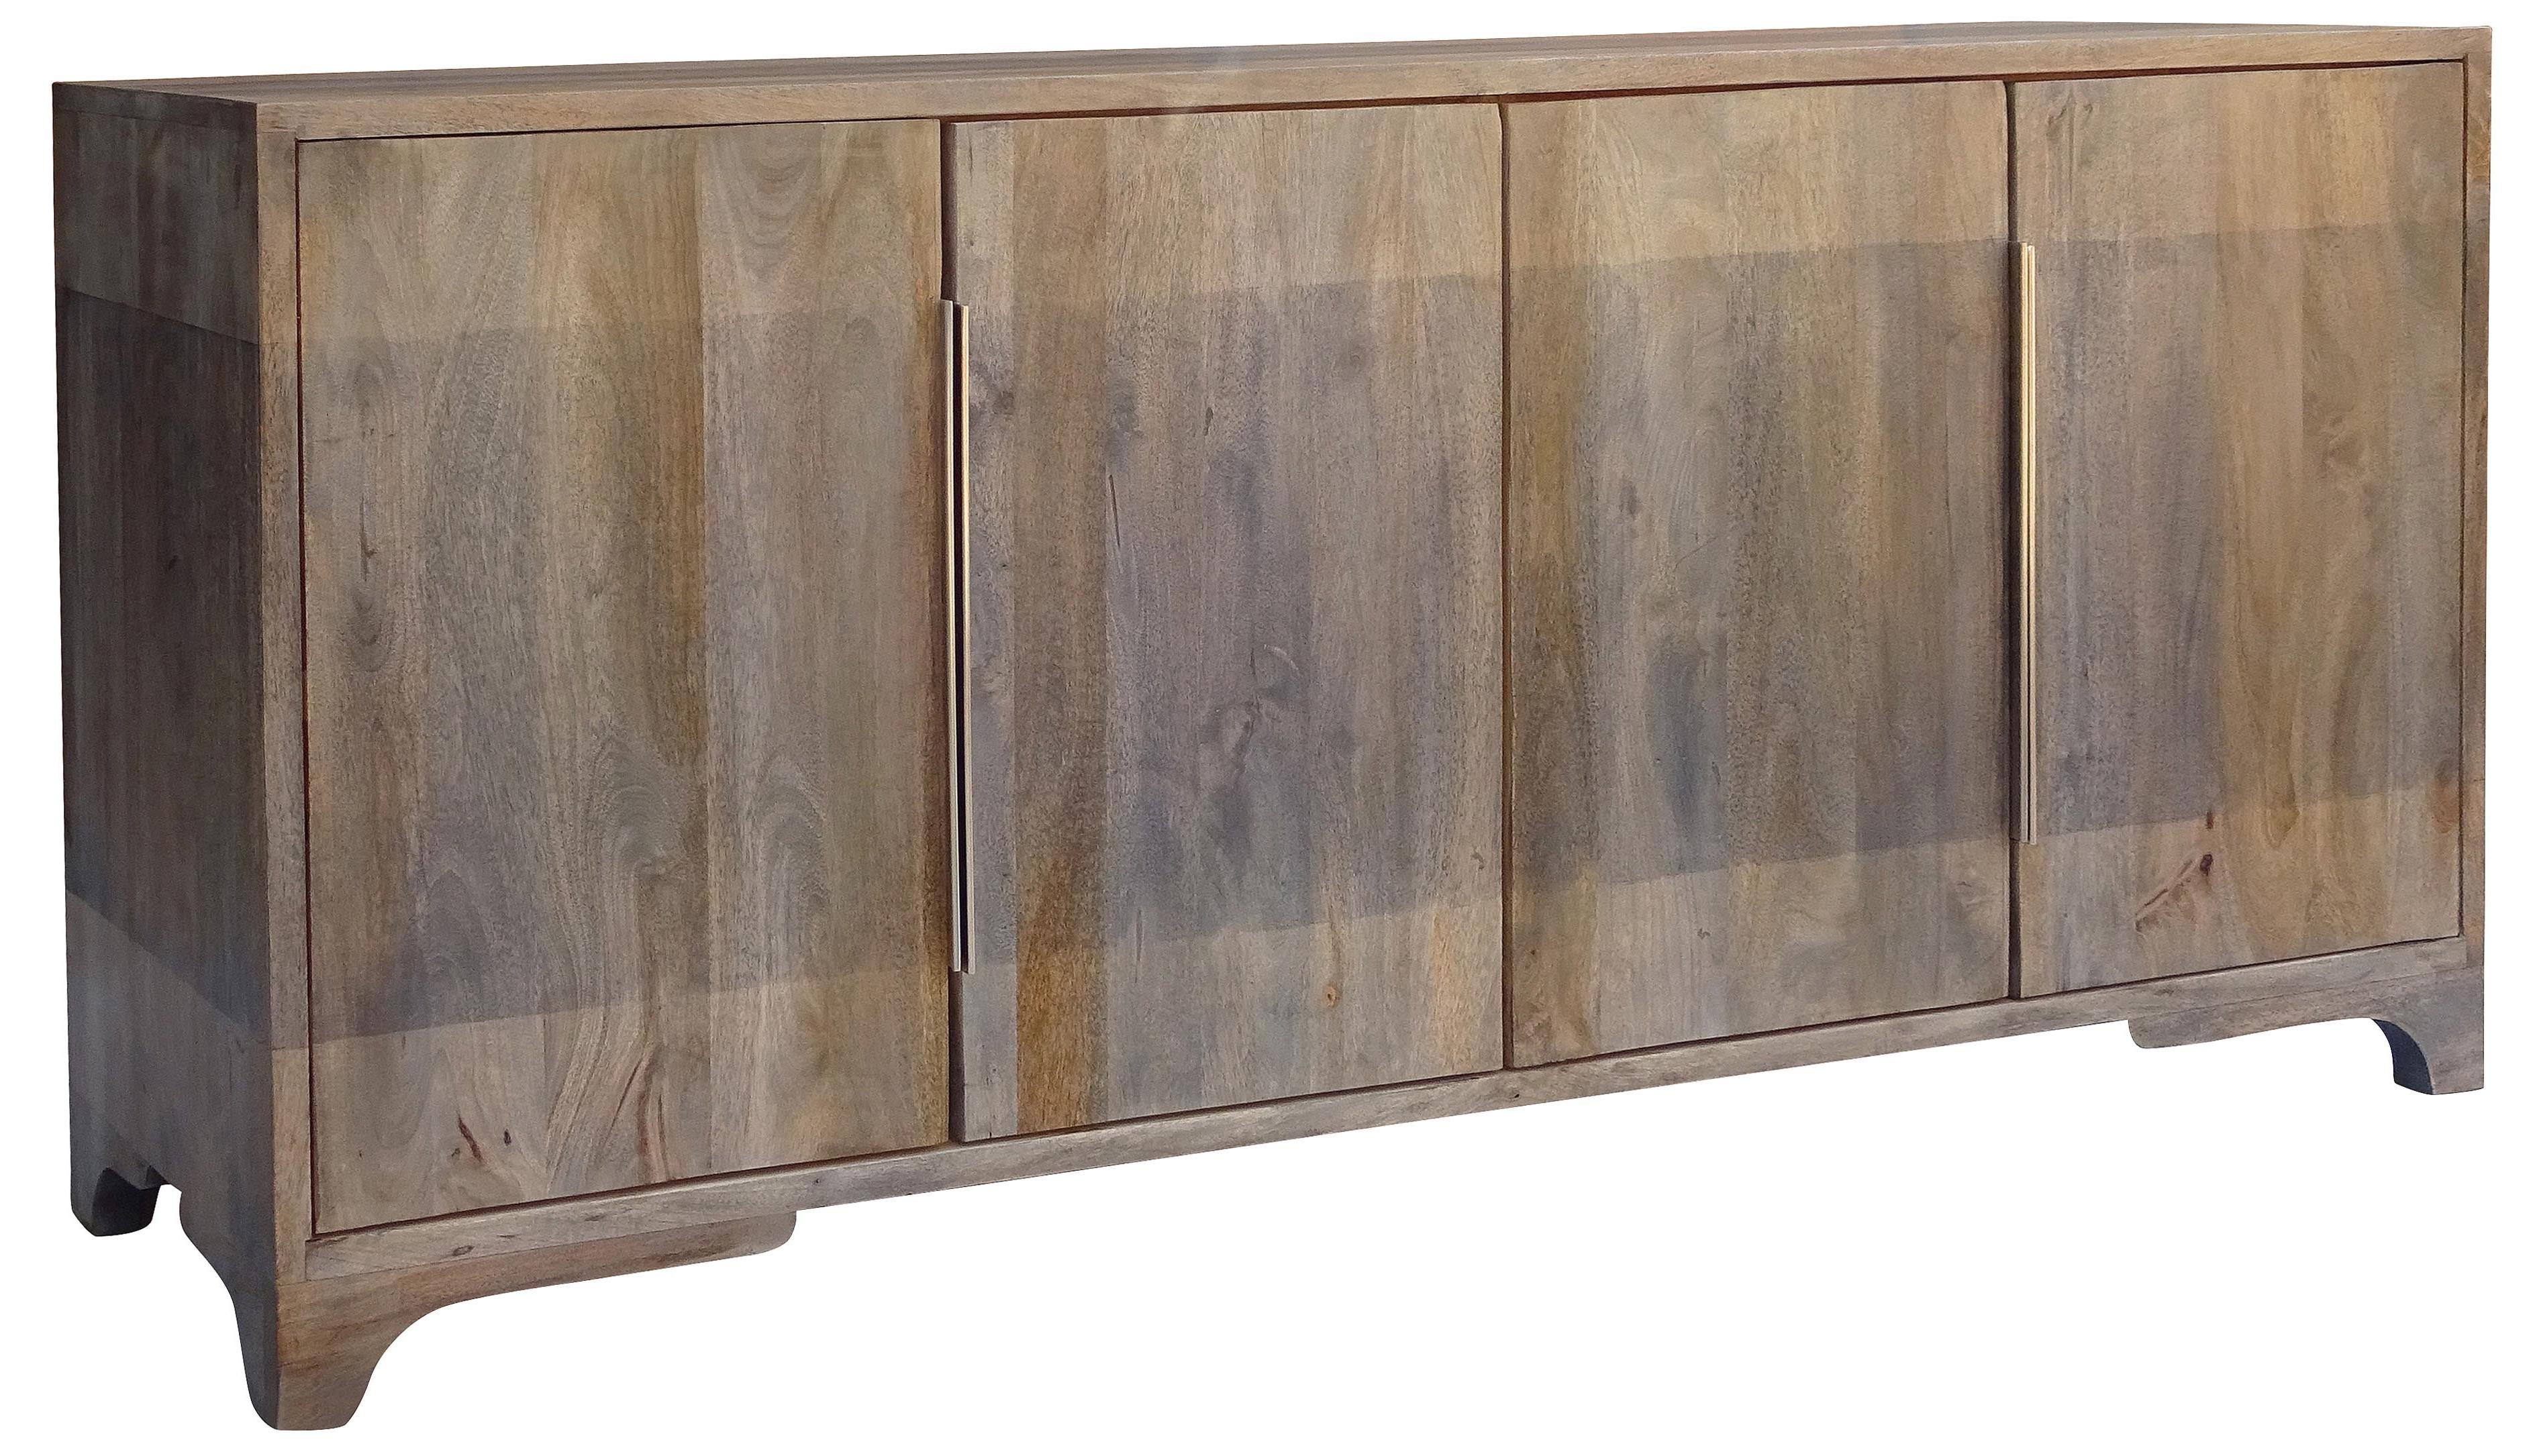 Popular Trent Austin Design Nia Sideboard Throughout Steinhatchee Reclaimed Pine 4 Door Sideboards (Gallery 5 of 20)